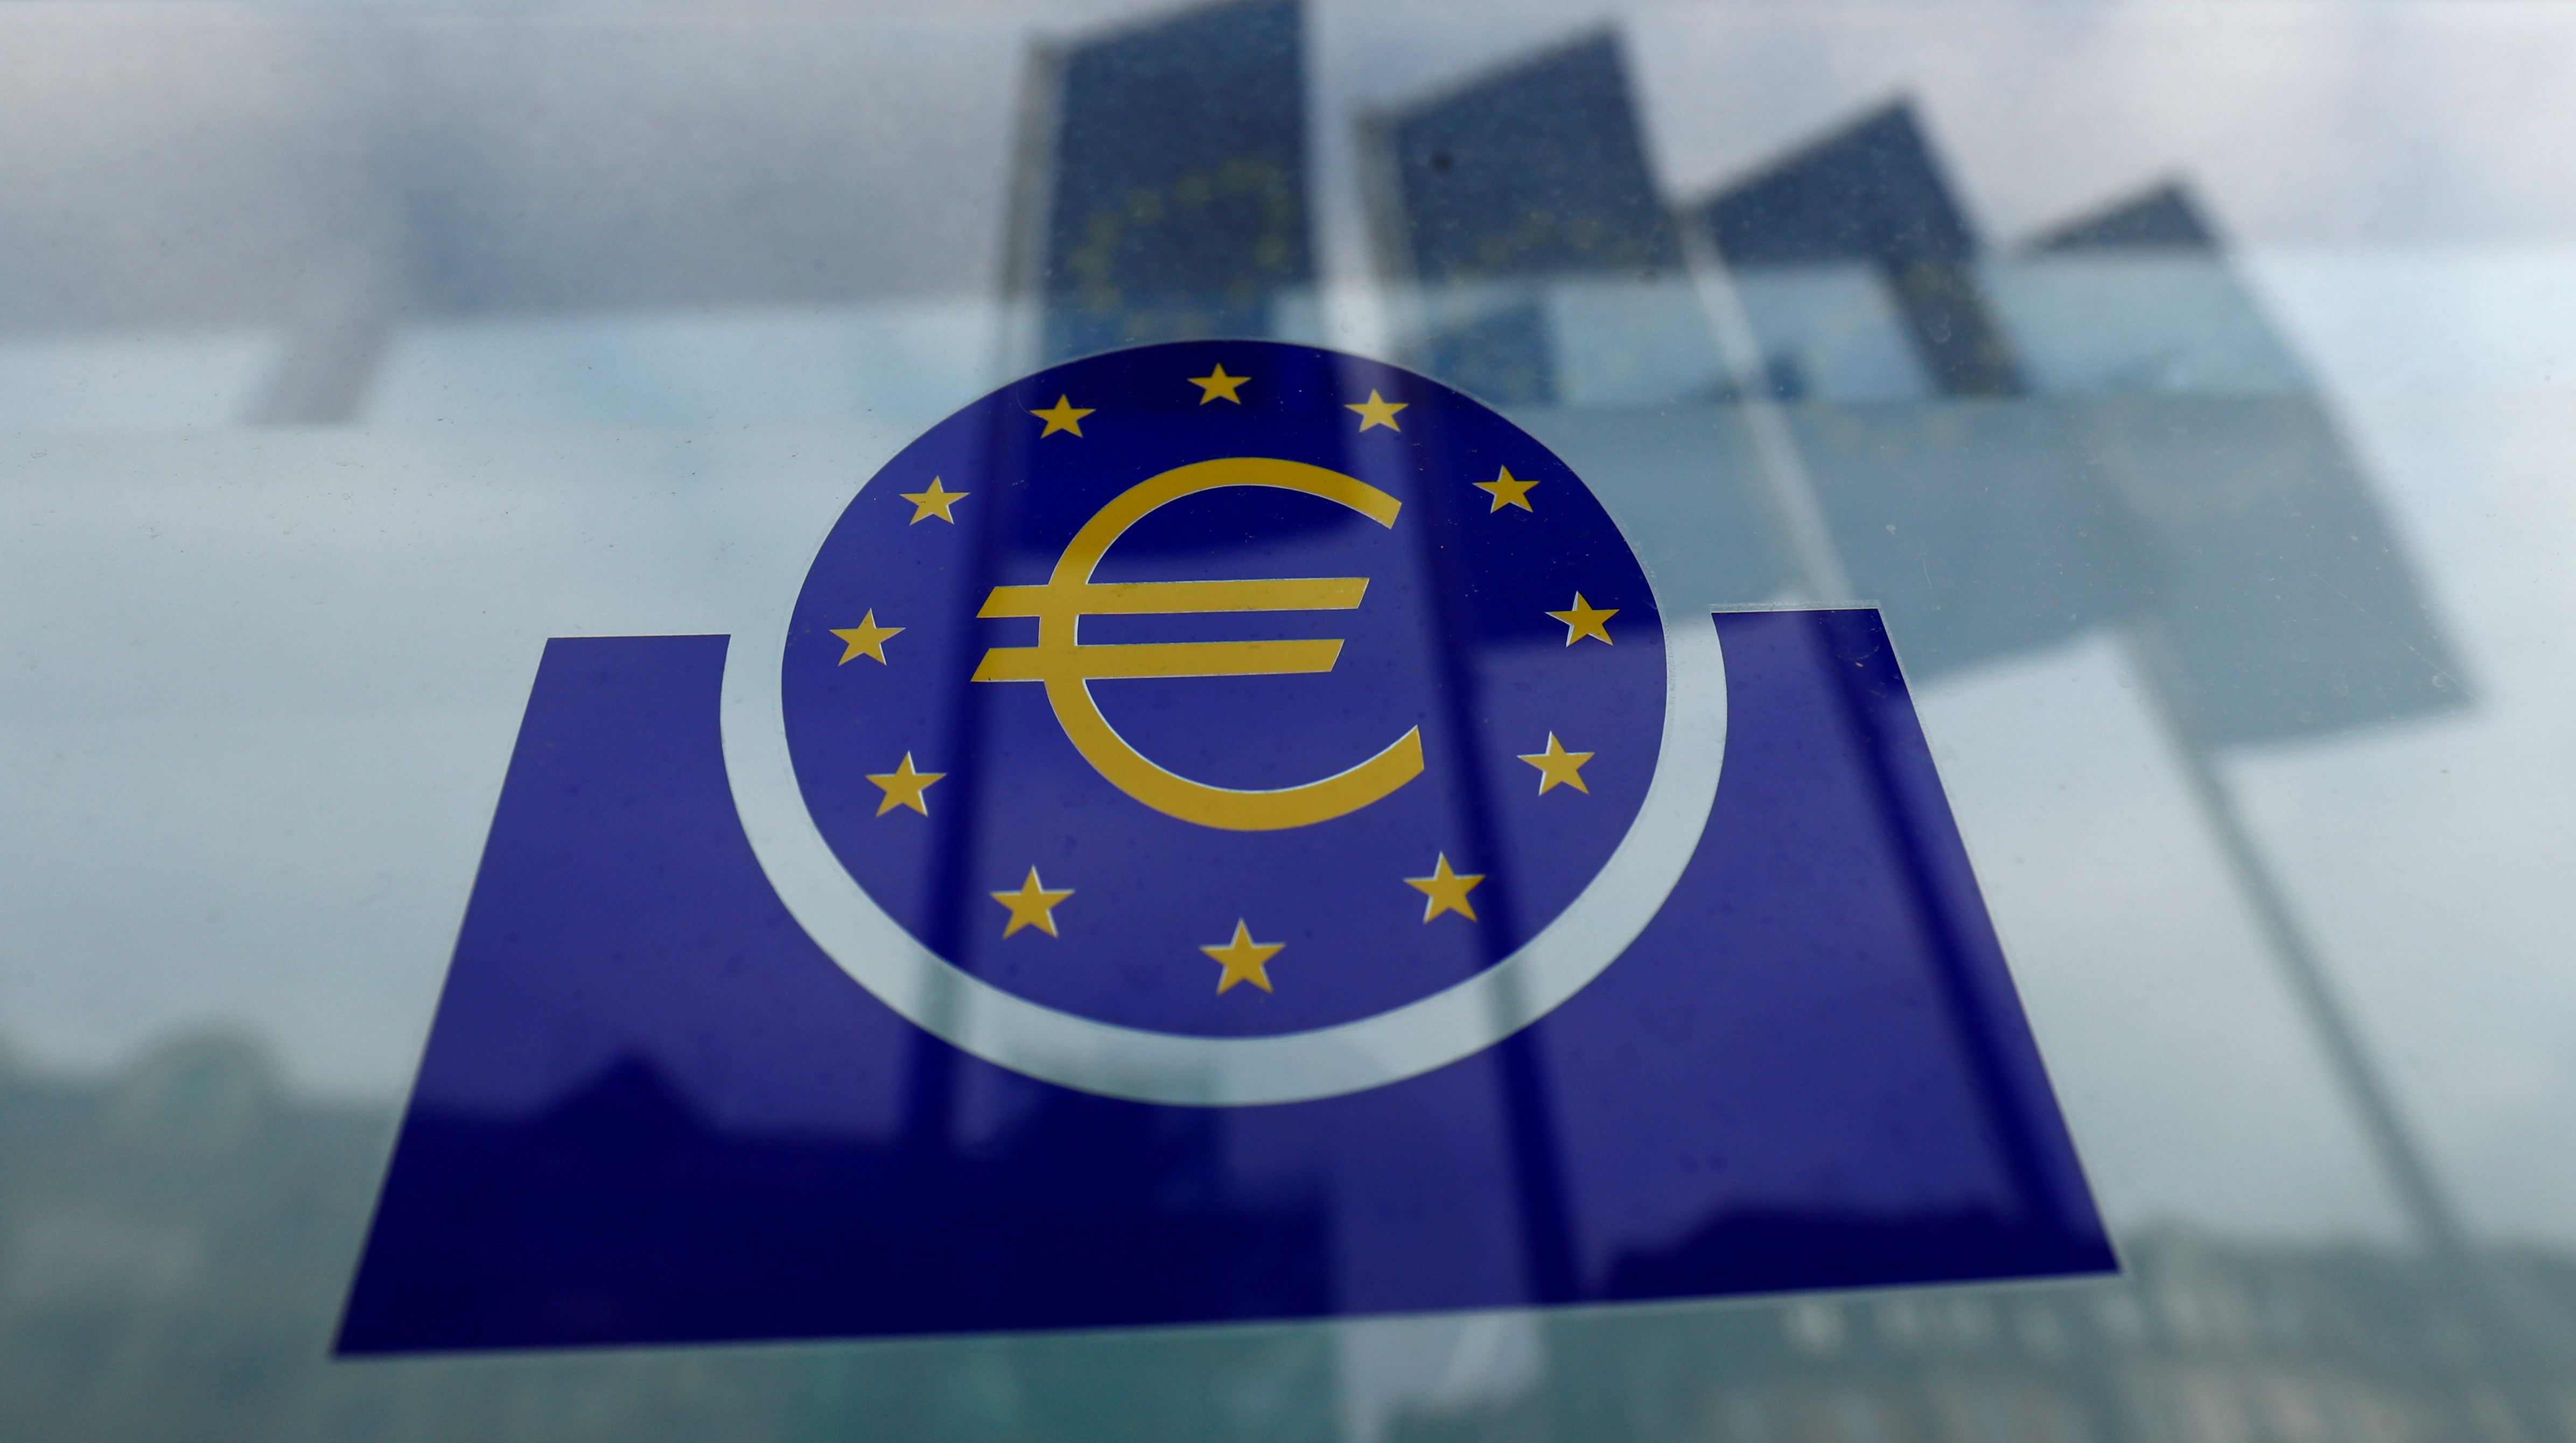 The European Central Bank logo. Frankfurt, Germany, January 23, 2020. REUTERS/Ralph Orlowski